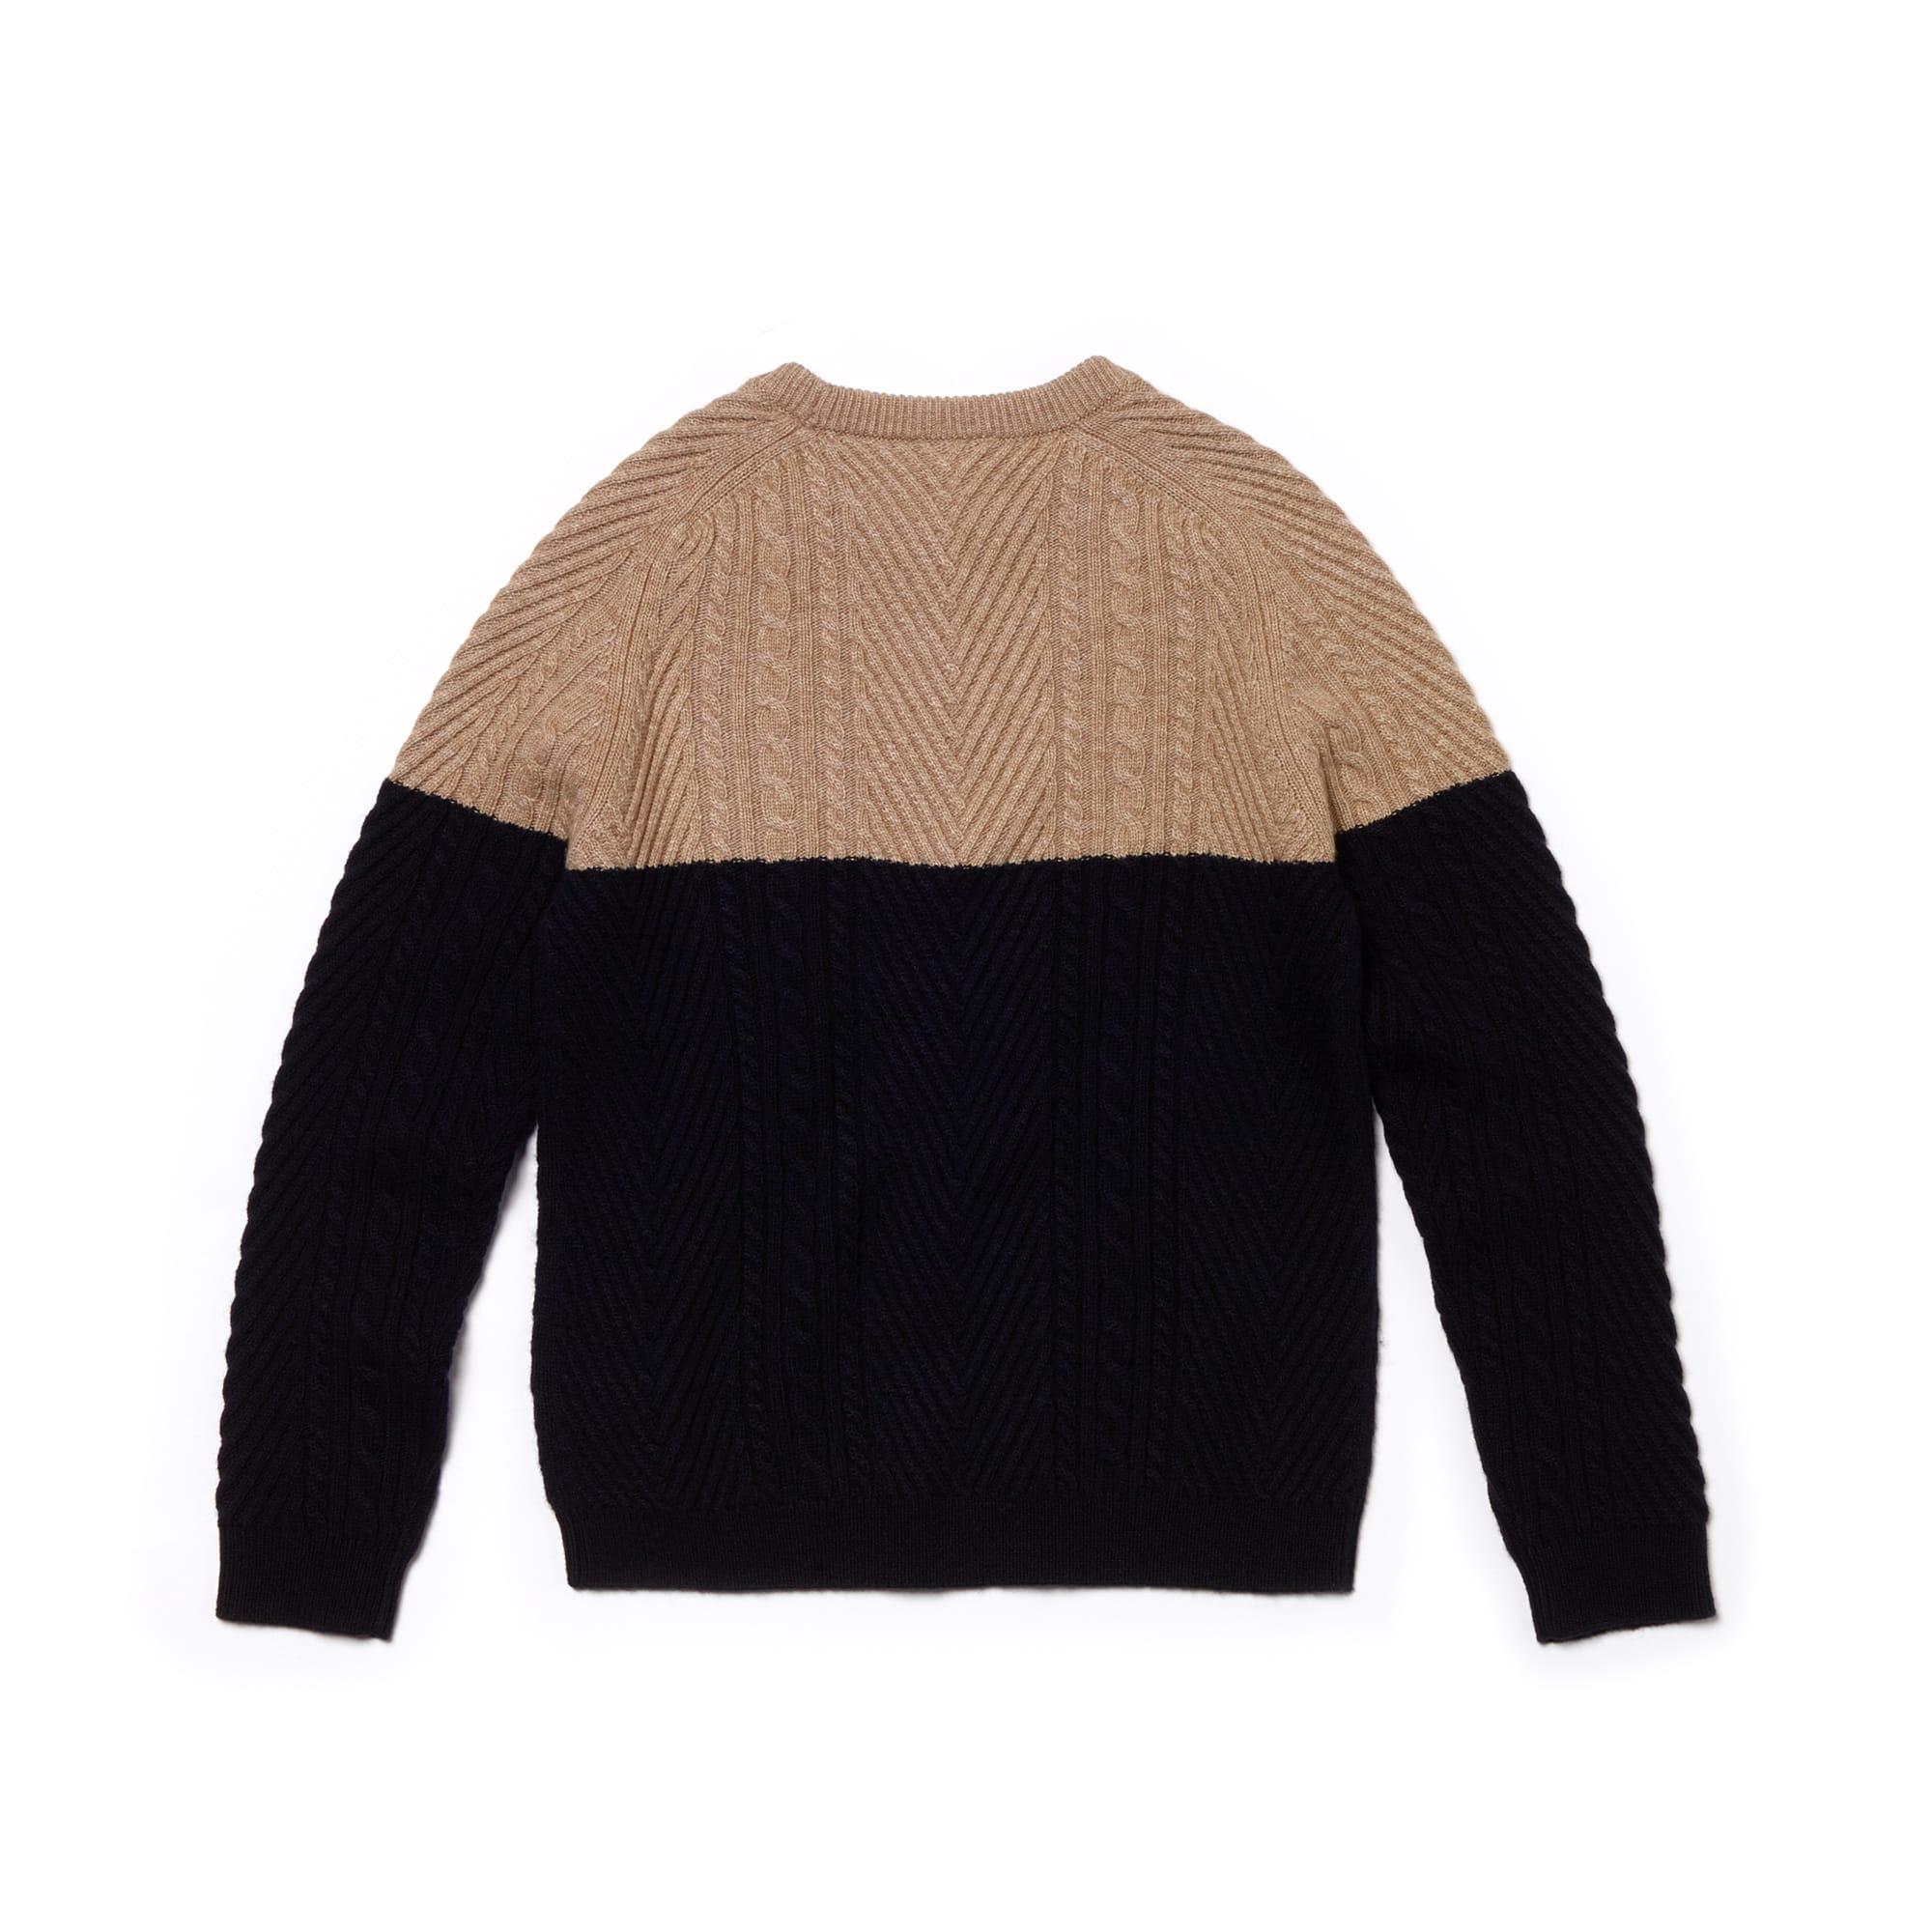 a8f9eba6a9 Boys' Crew Neck Cable Knit Colourblock Cotton Blend Sweater